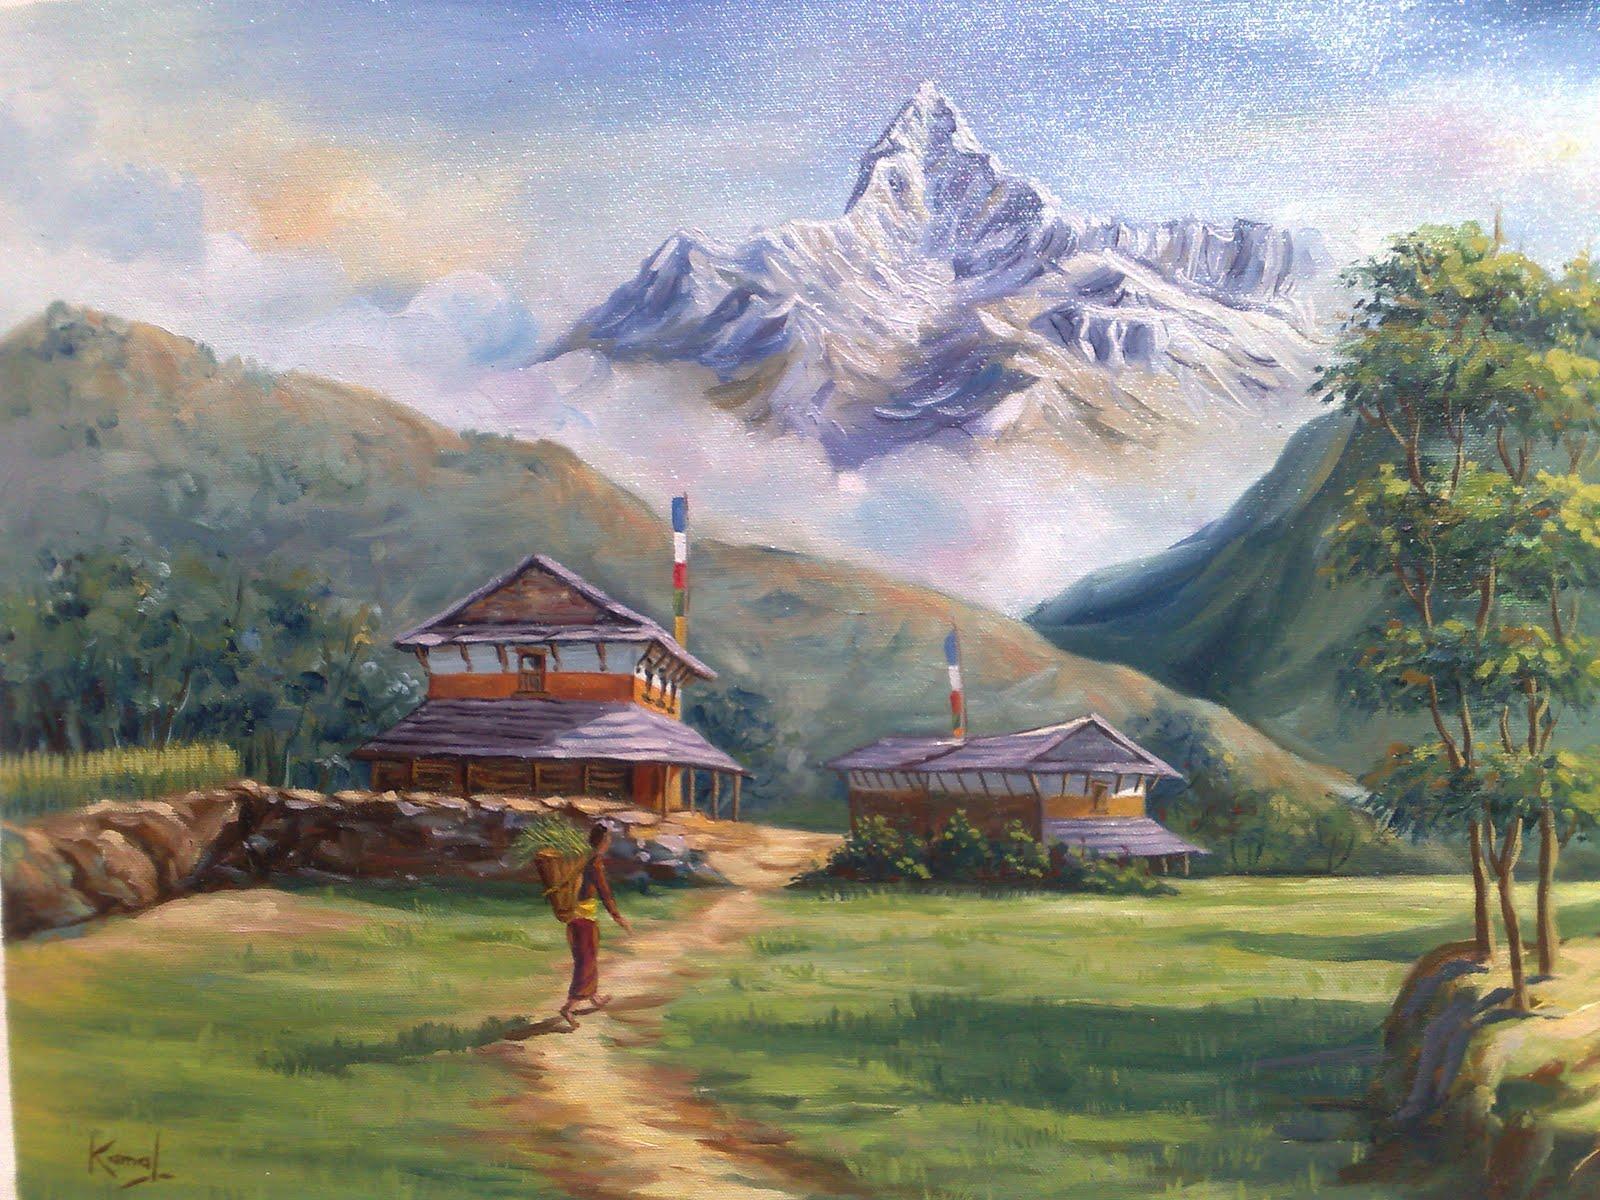 Lalitkala Creations: Beautiful watercolor landscape ...